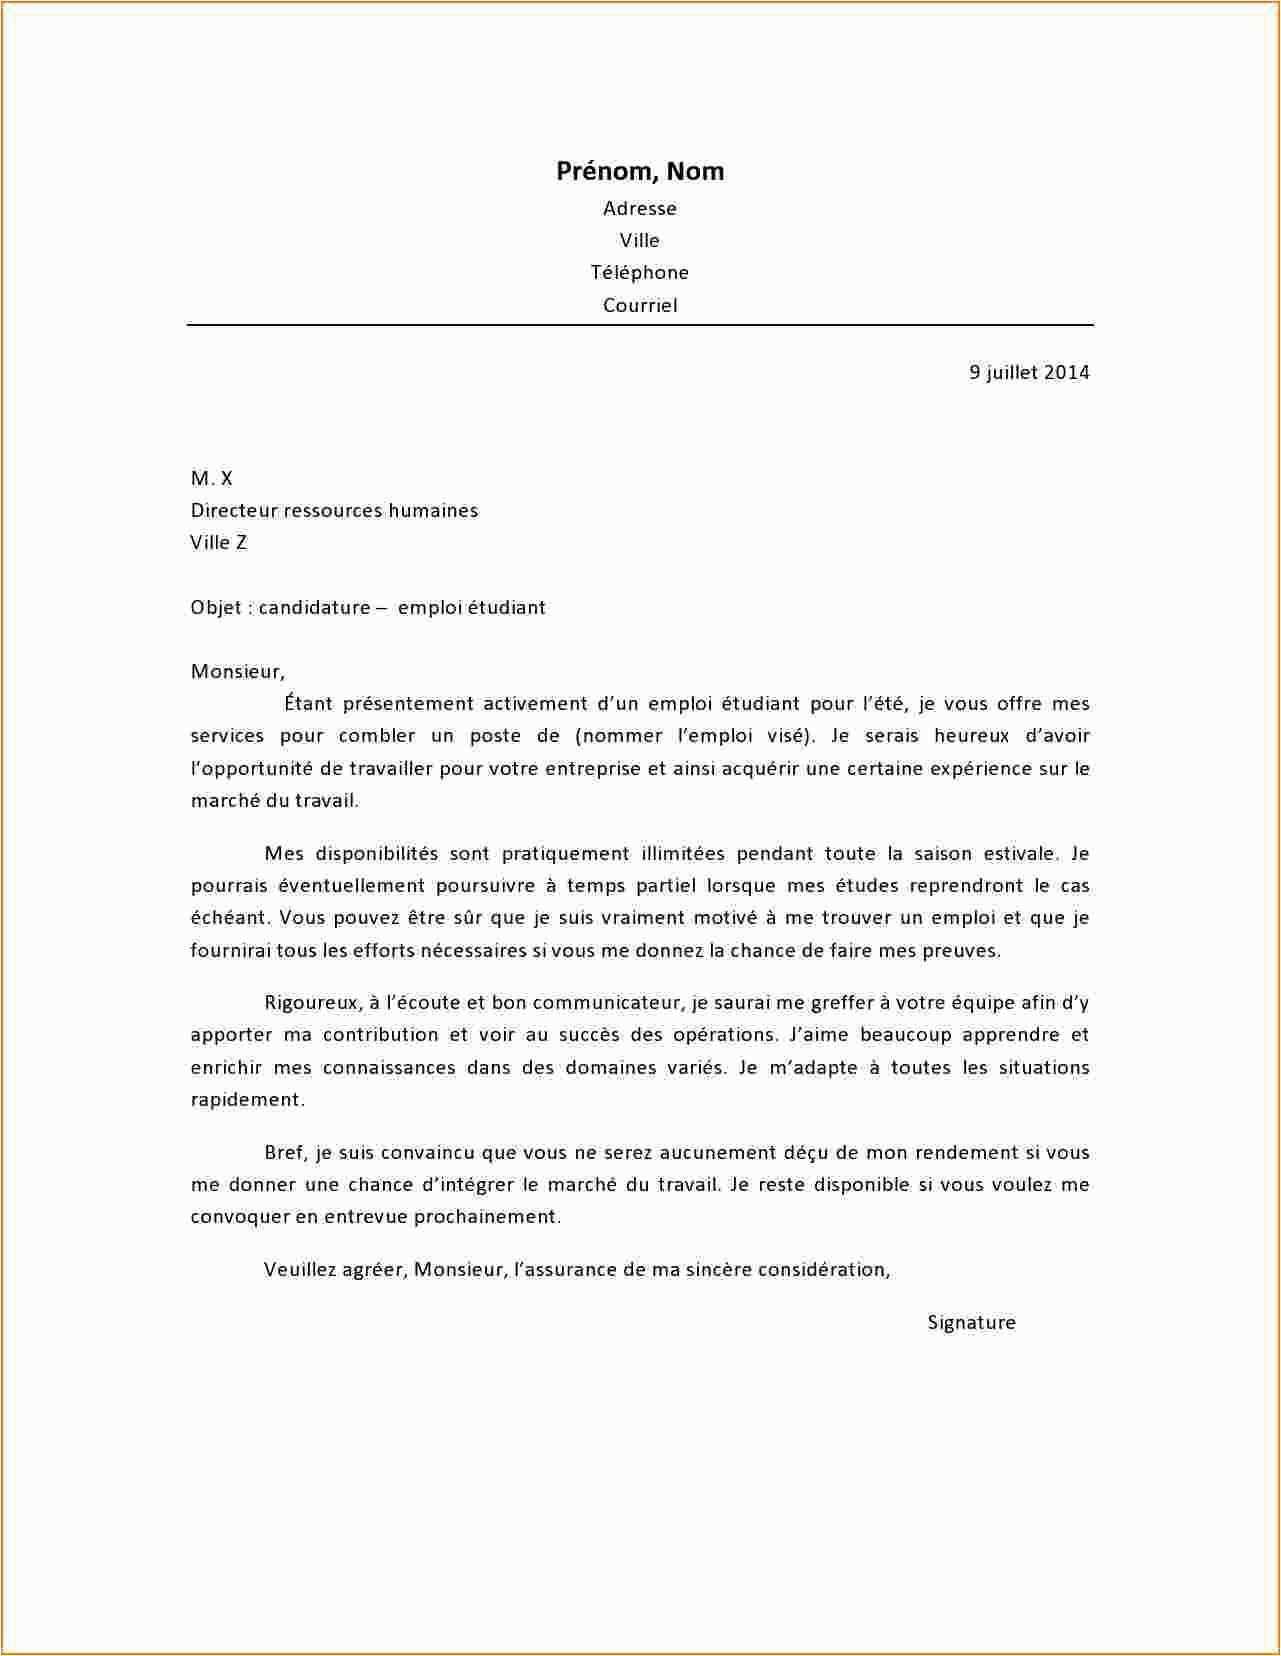 Lettre de motivation arh - laboite-cv.fr